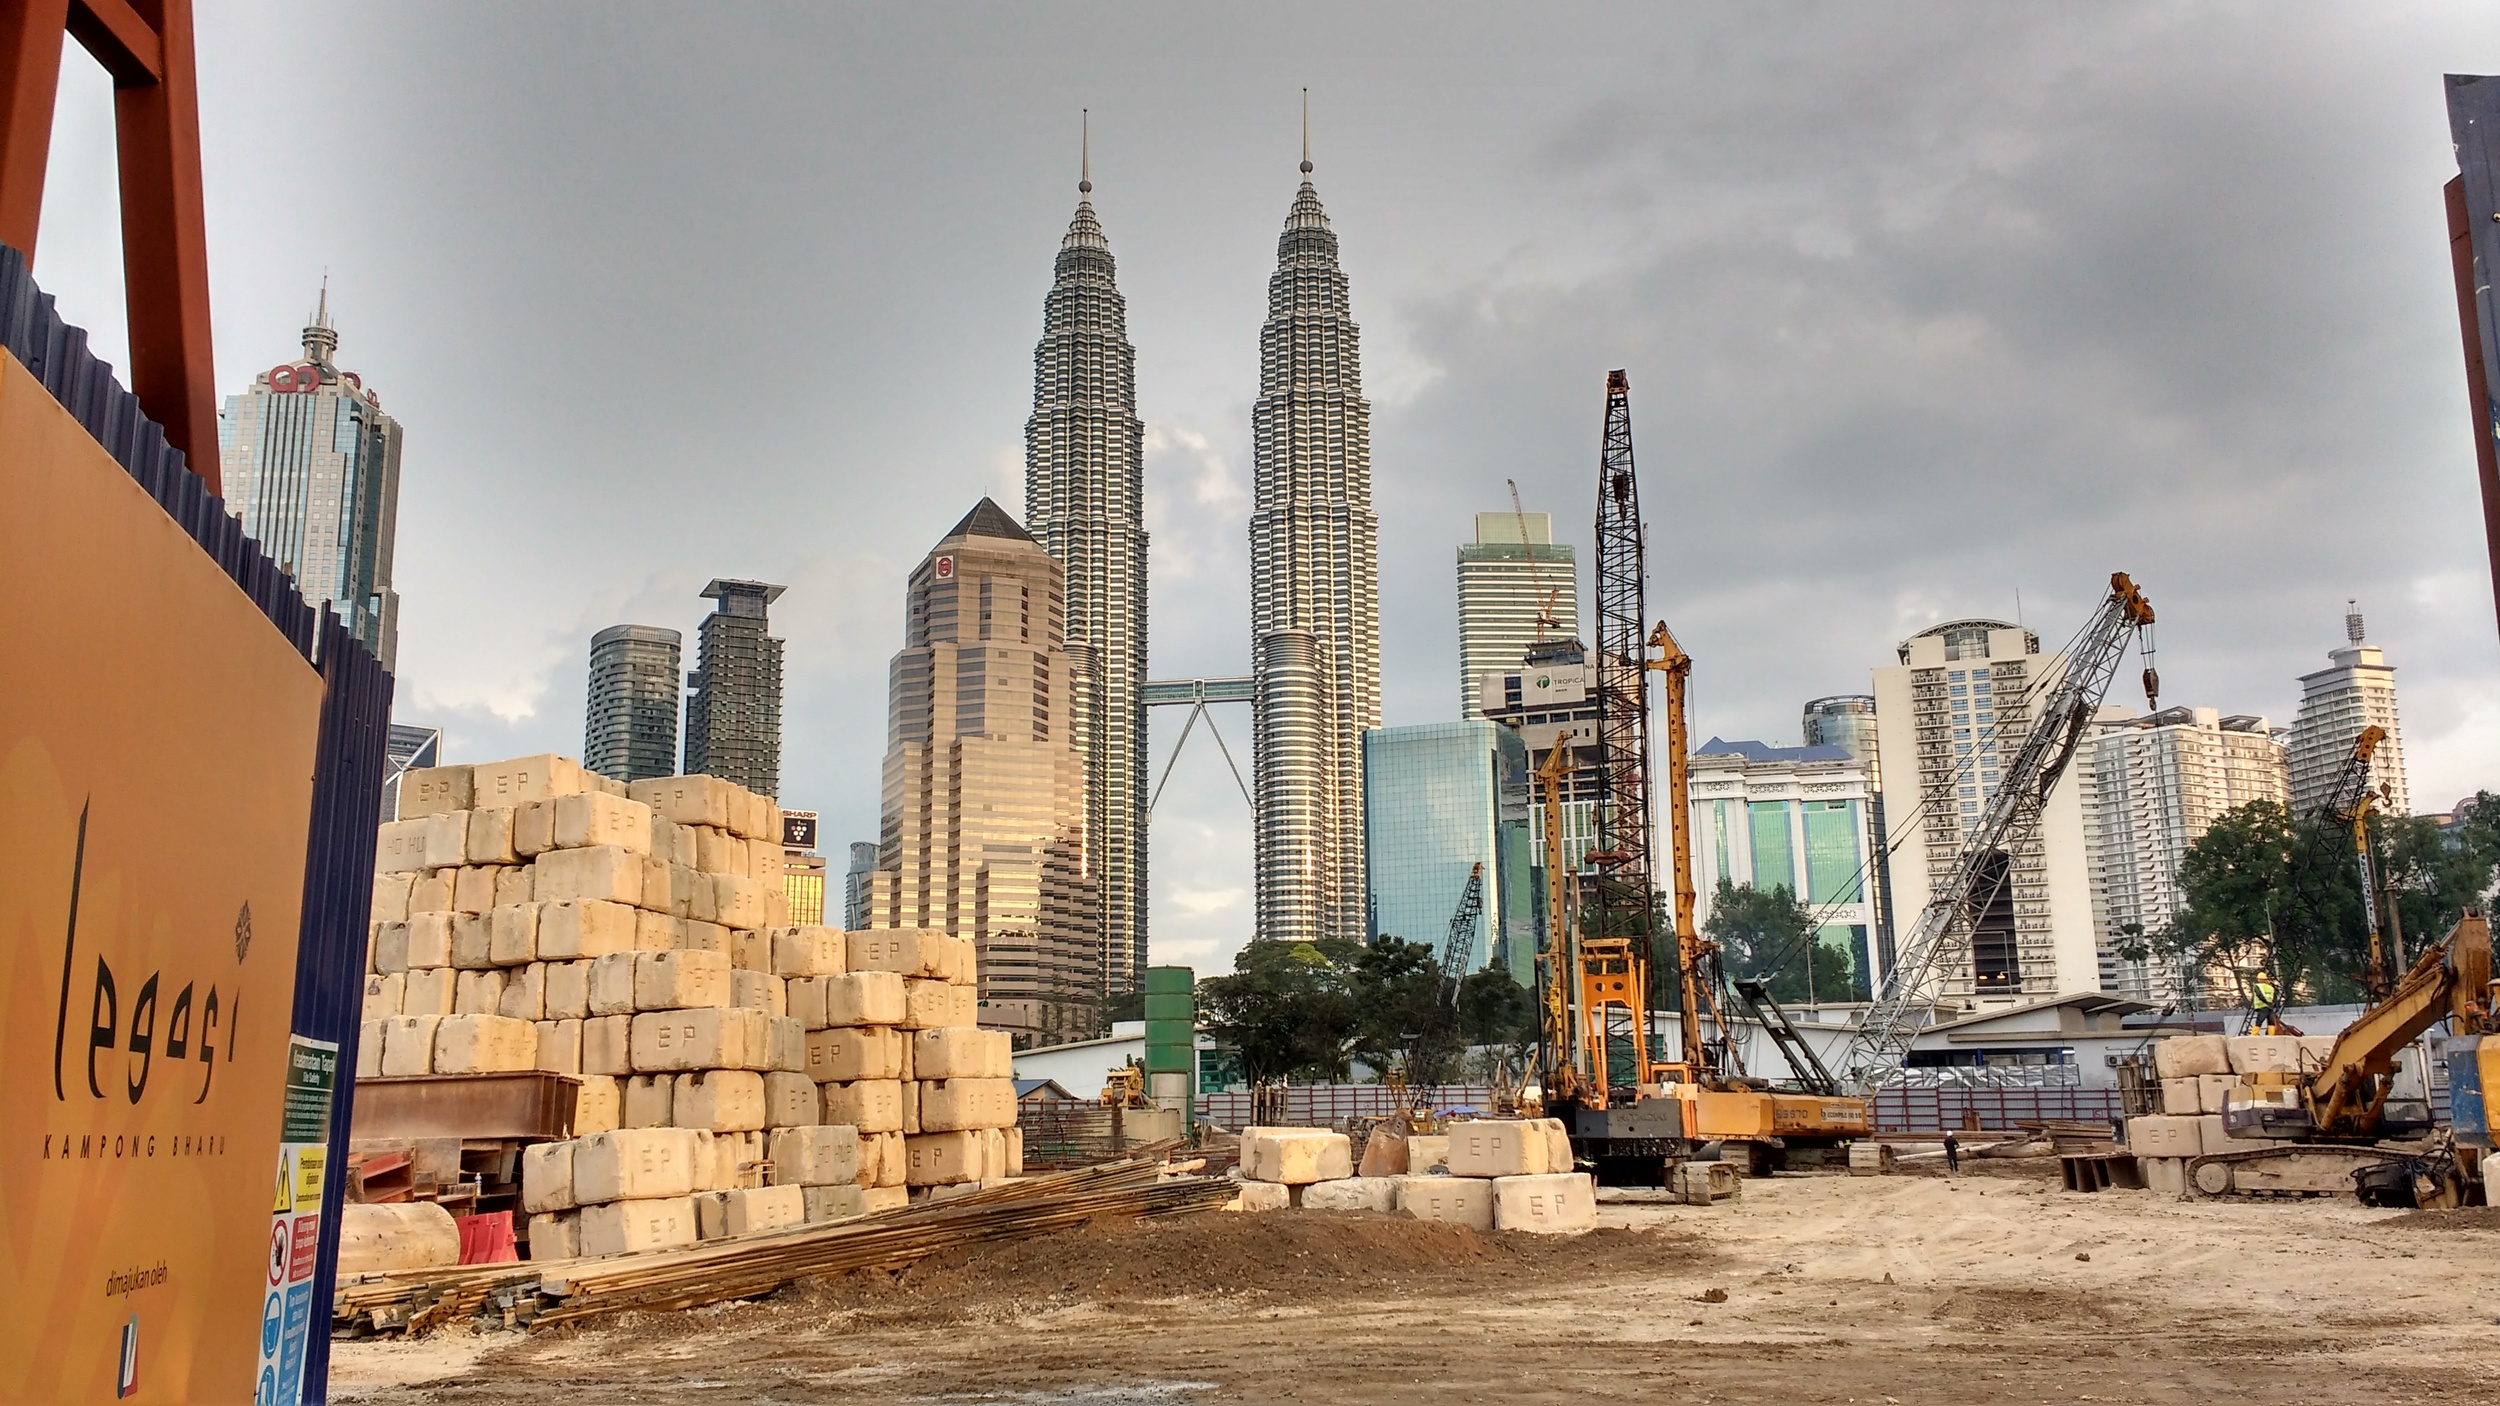 Luxury condominium project under construction on the site of the former Weekend Night Market. Photo: Vishnu Prasad